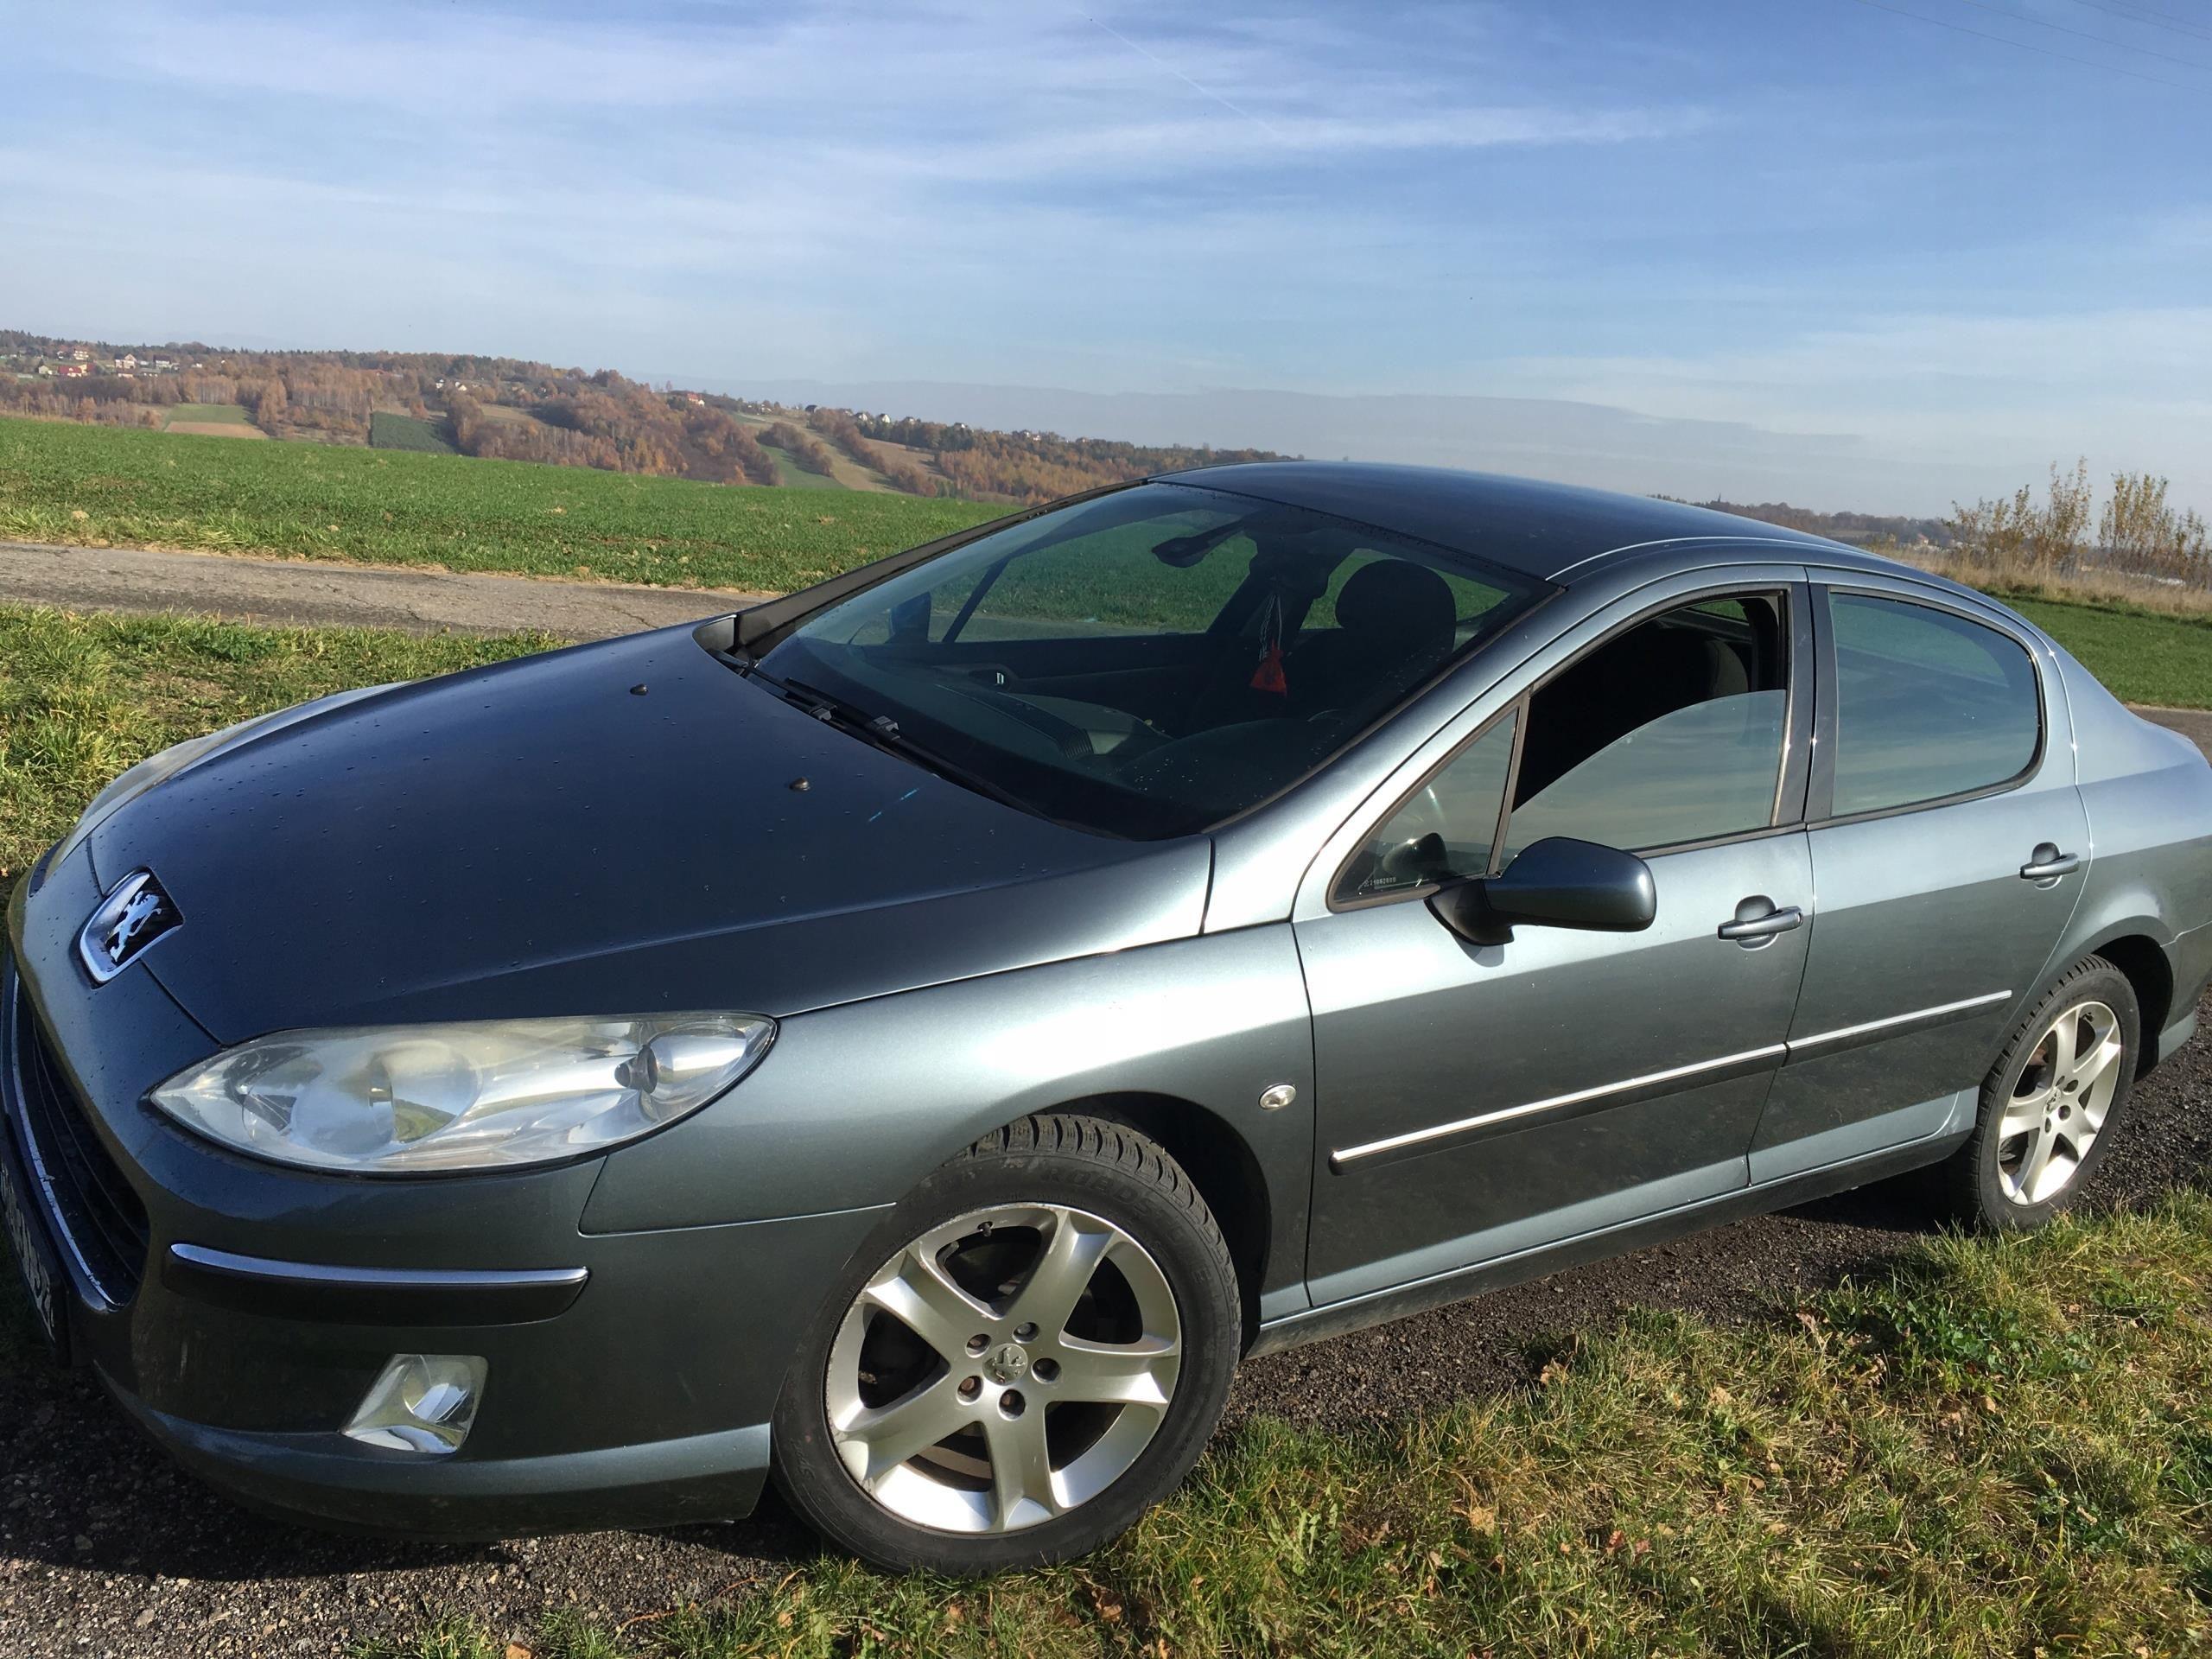 Peugeot 407 2 0 Hdi 136km Opinie I Ceny Na Ceneo Pl